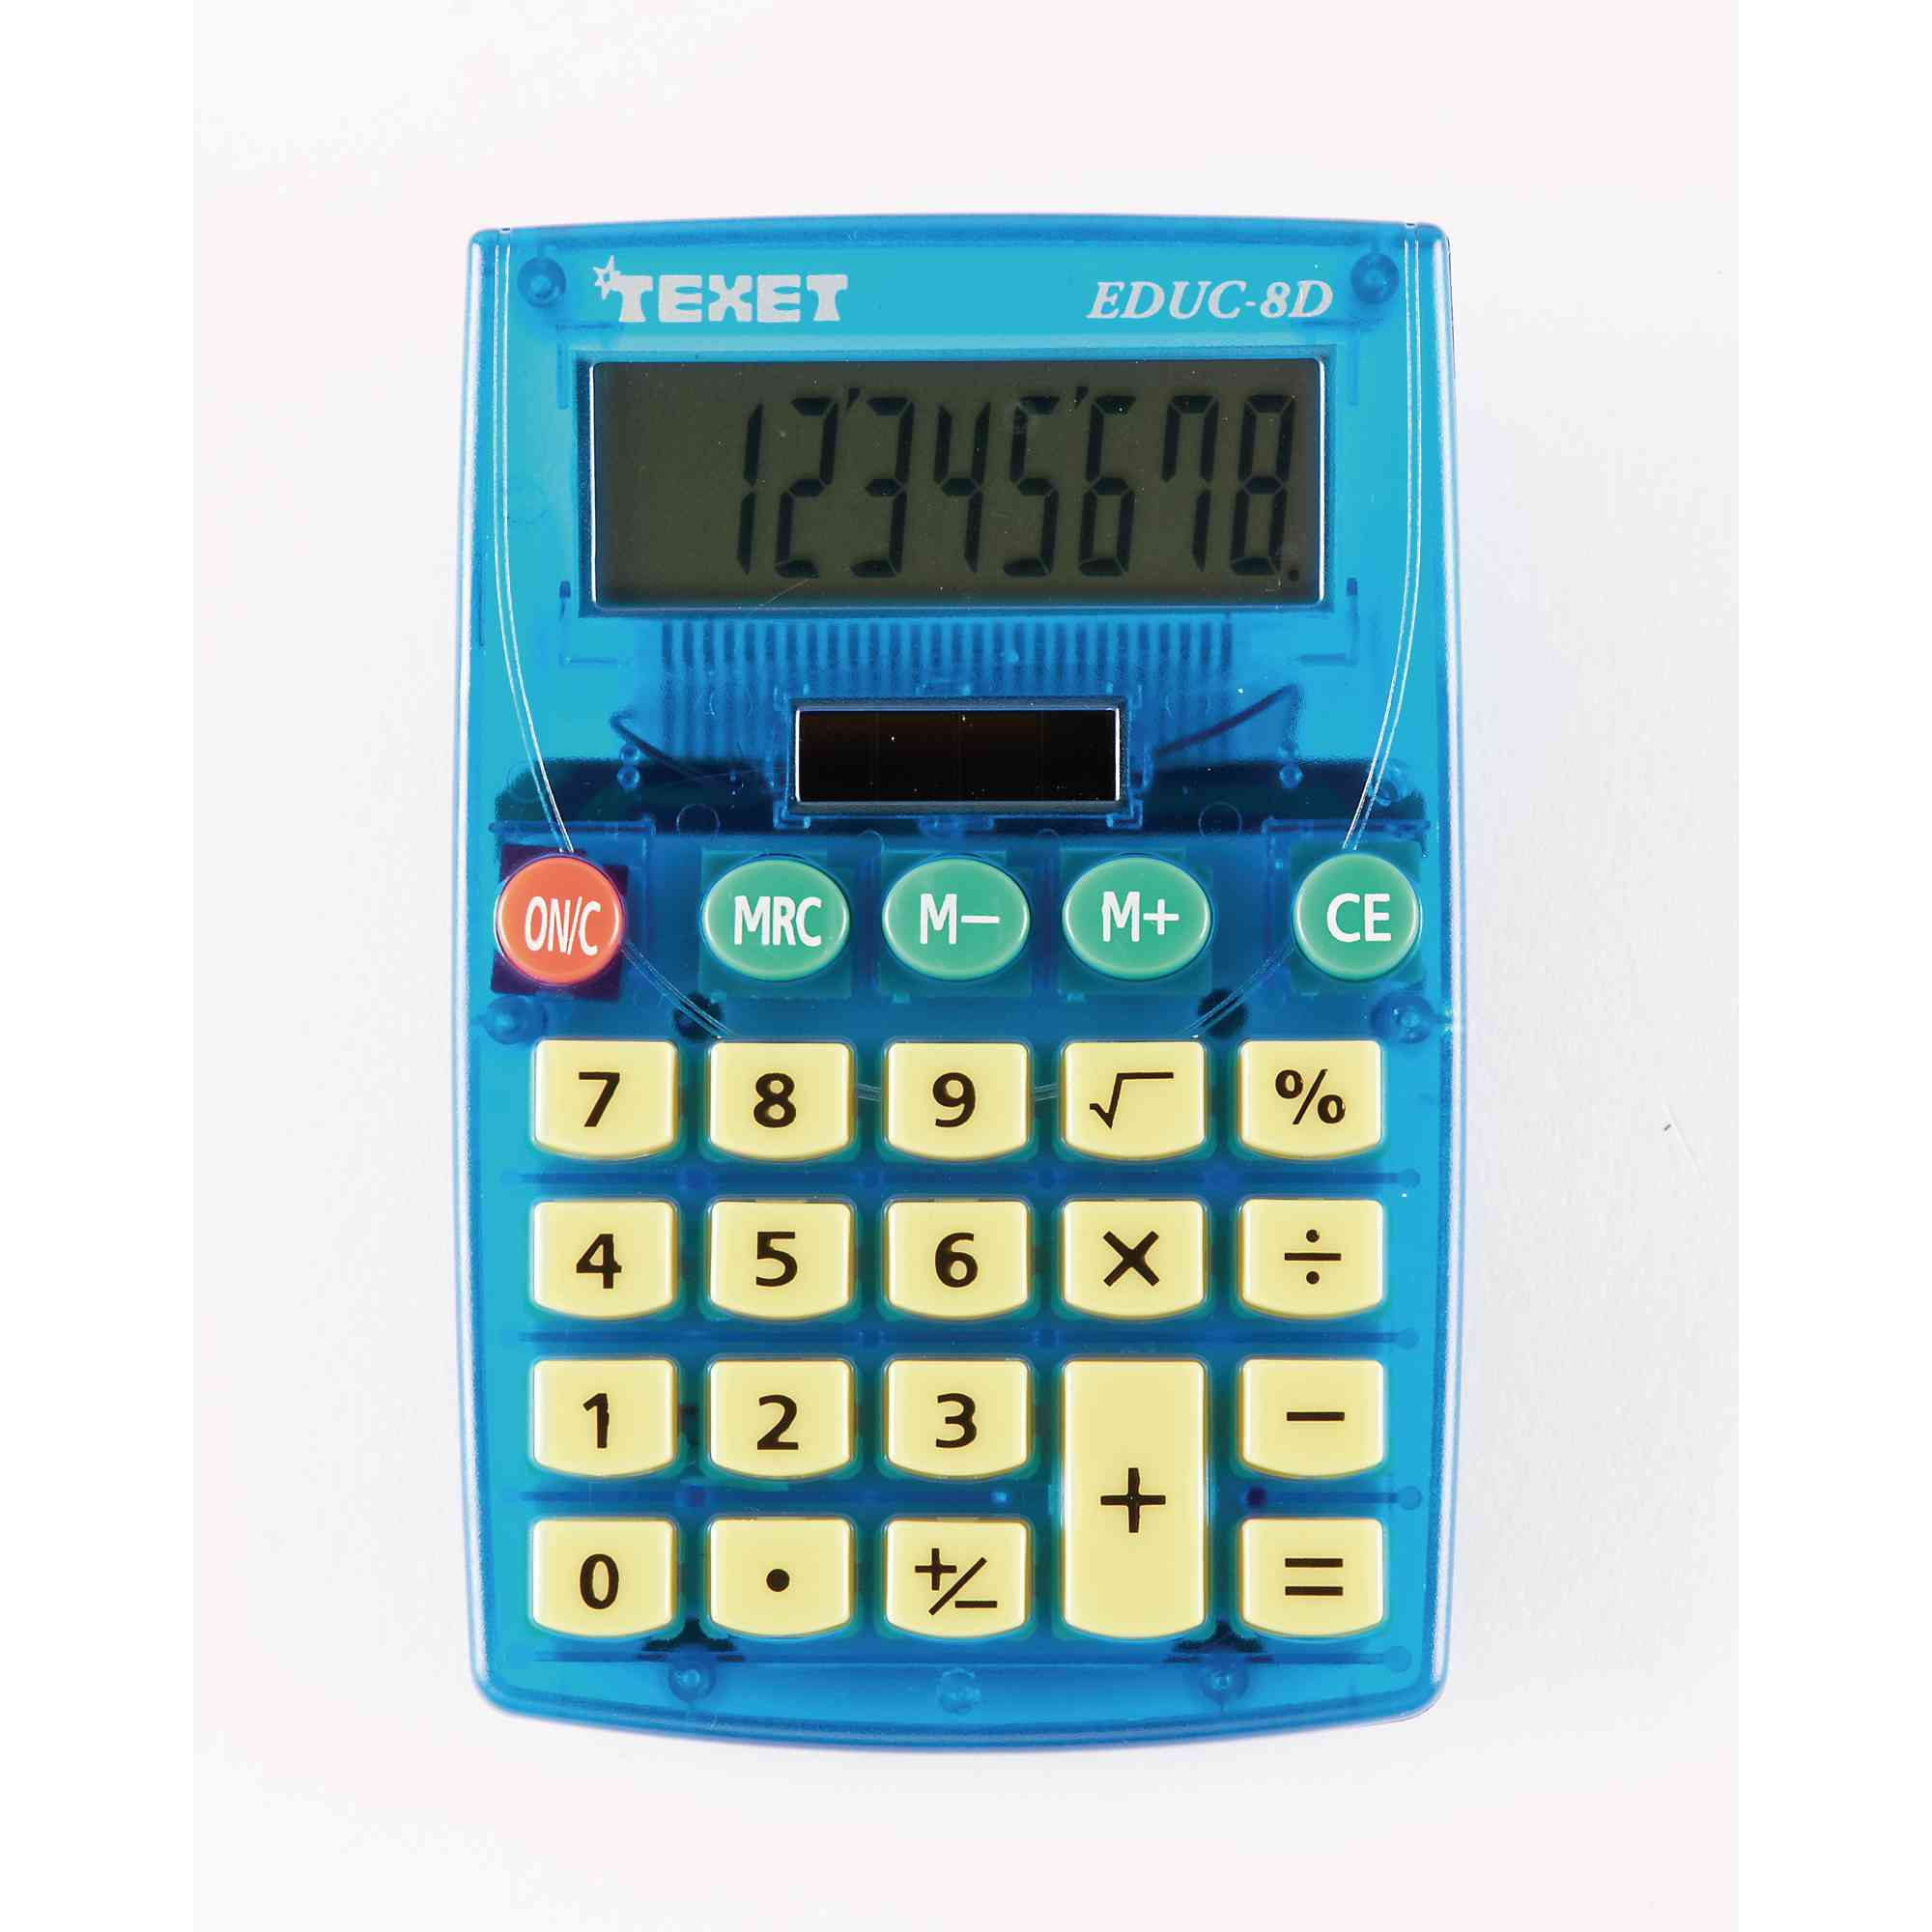 Texet Educ-8d Calculator